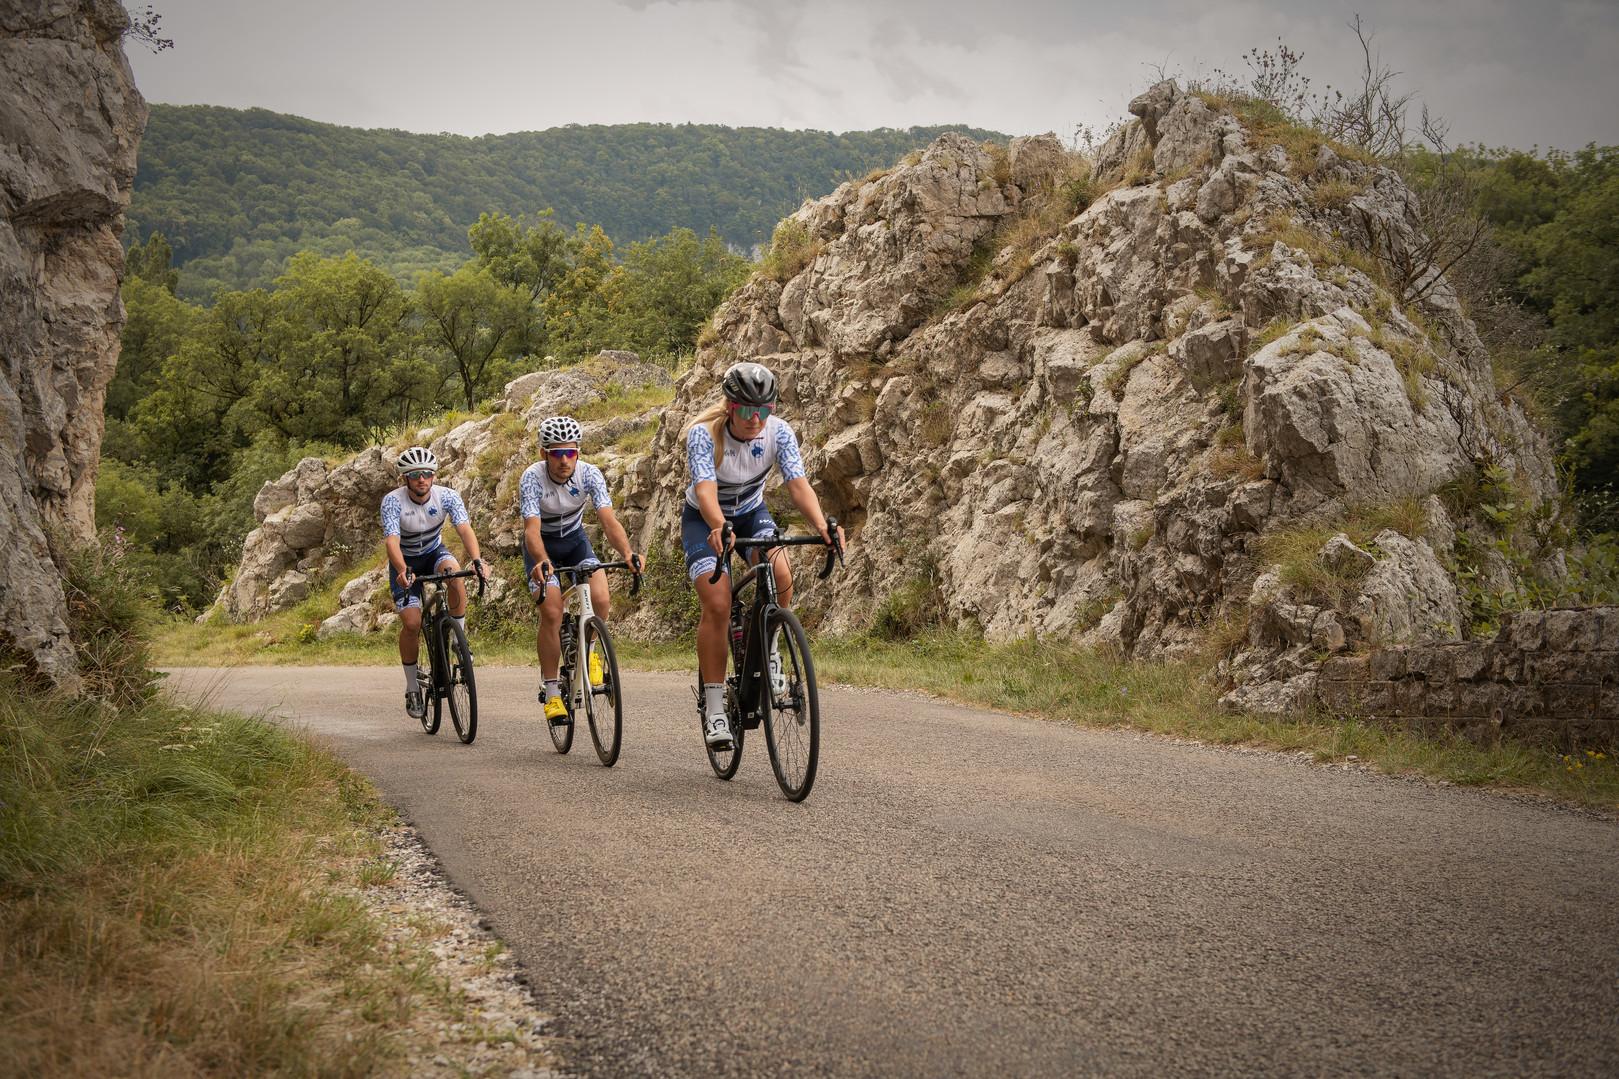 Equipe WinSleek - Route